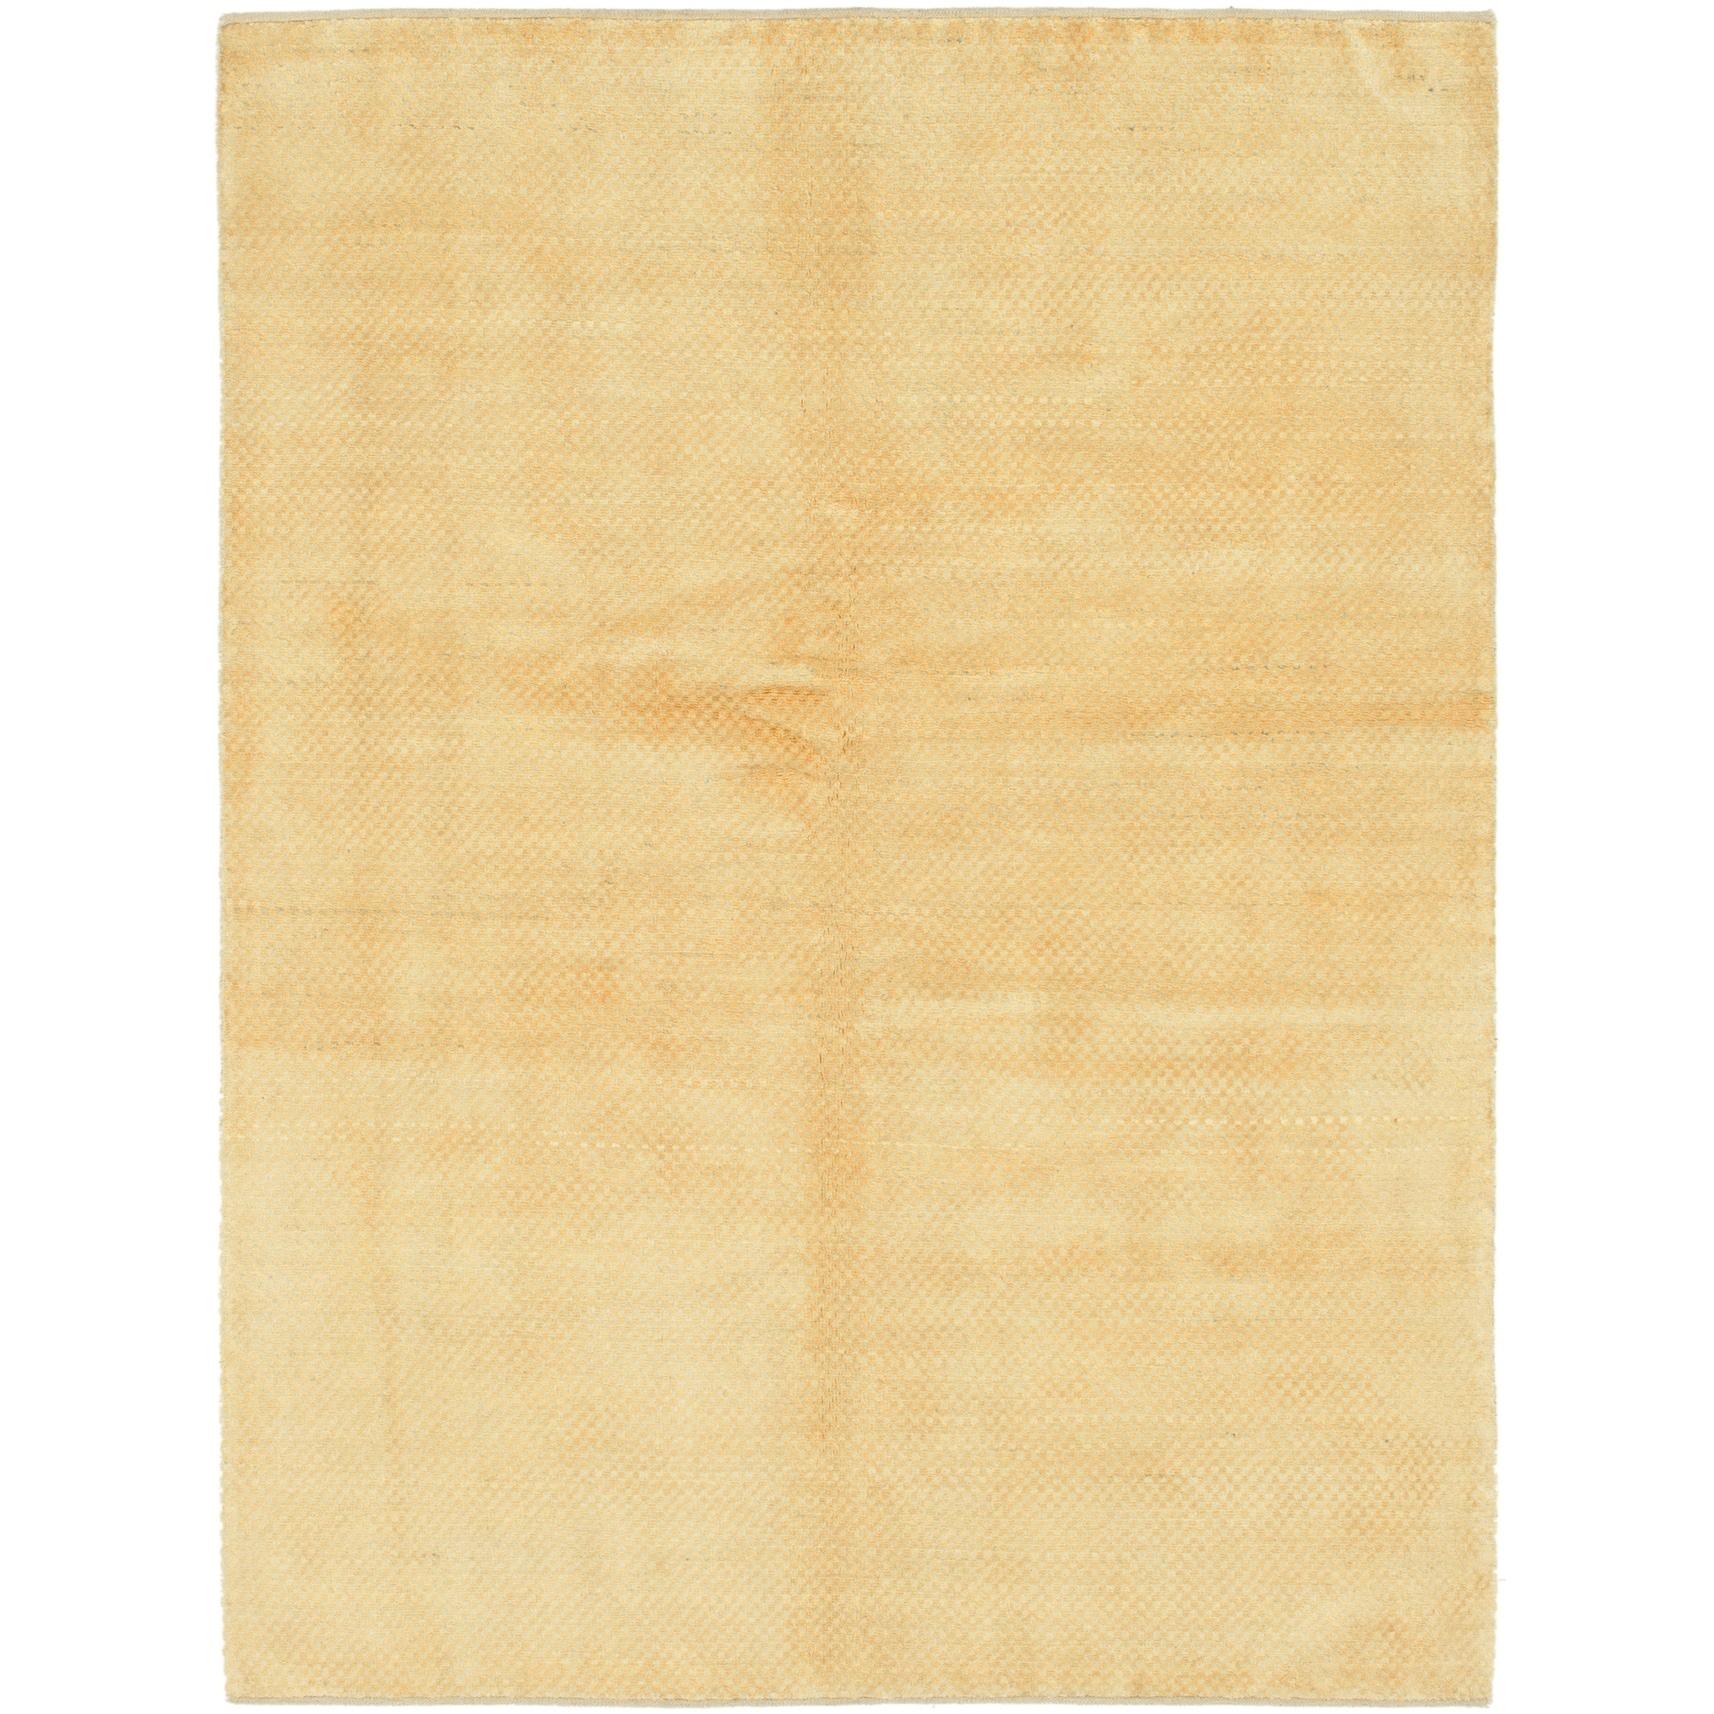 Hand Knotted Kashkuli Gabbeh Wool Area Rug - 5 x 6 7 (Gold - 5 x 6 7)